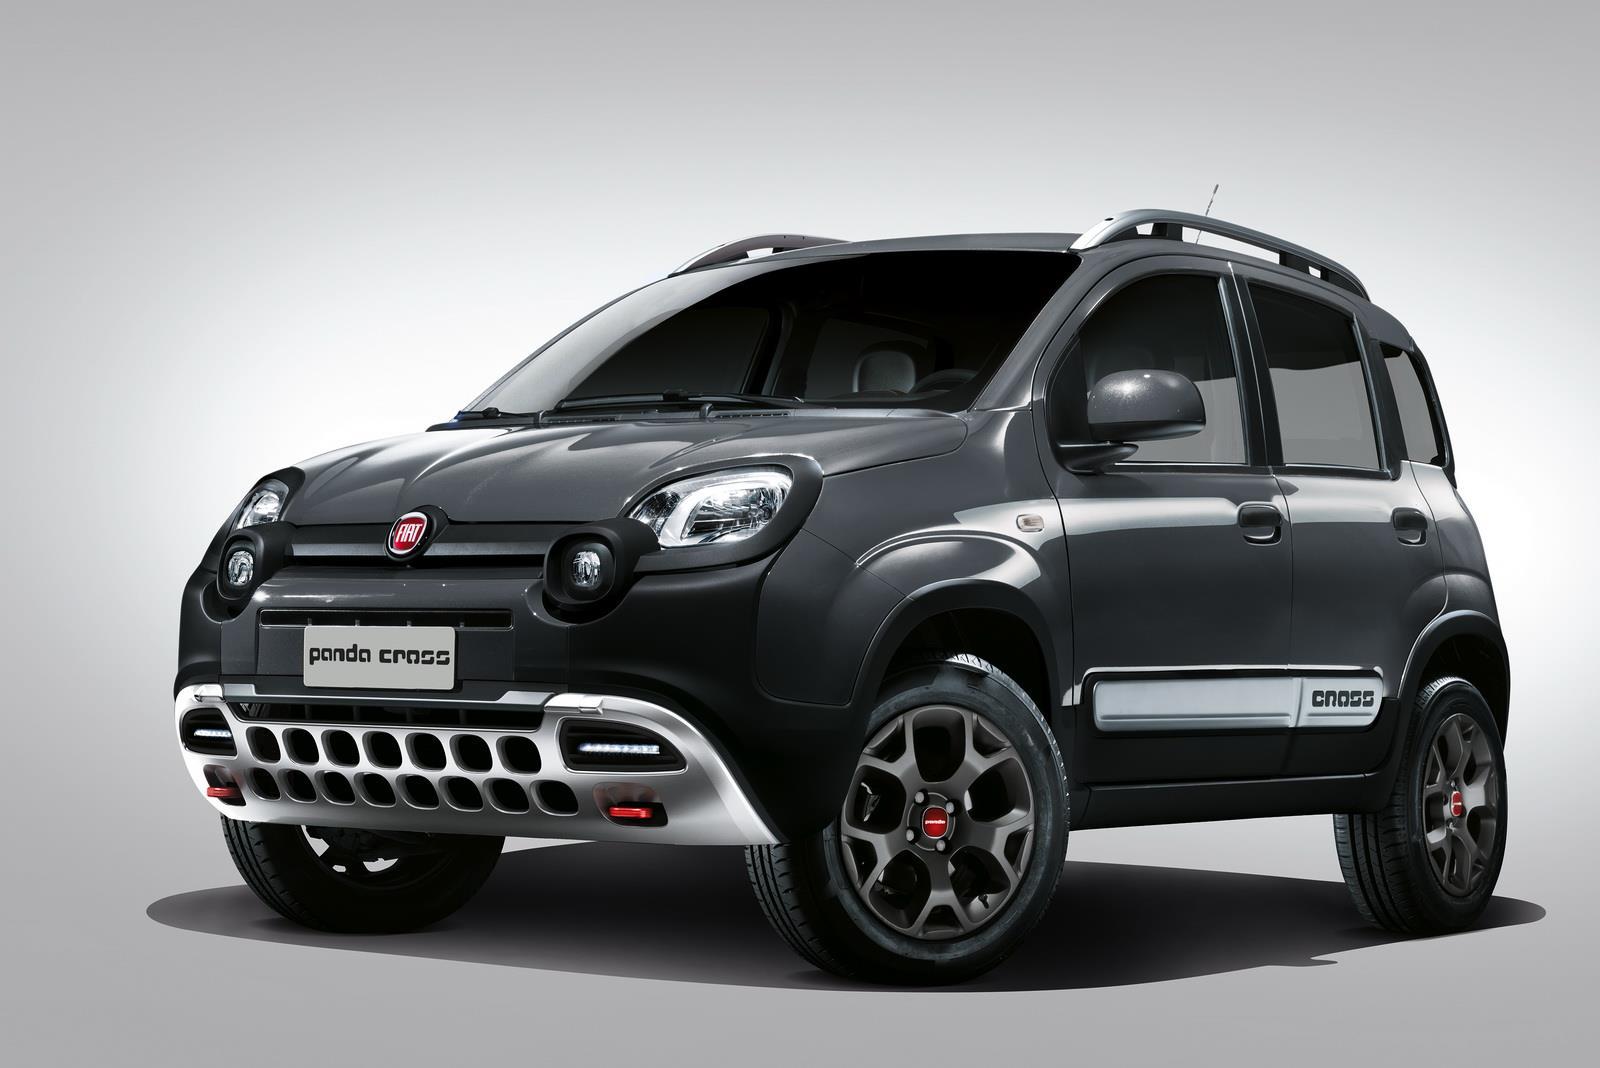 2017 Fiat Panda Cross photo gallery